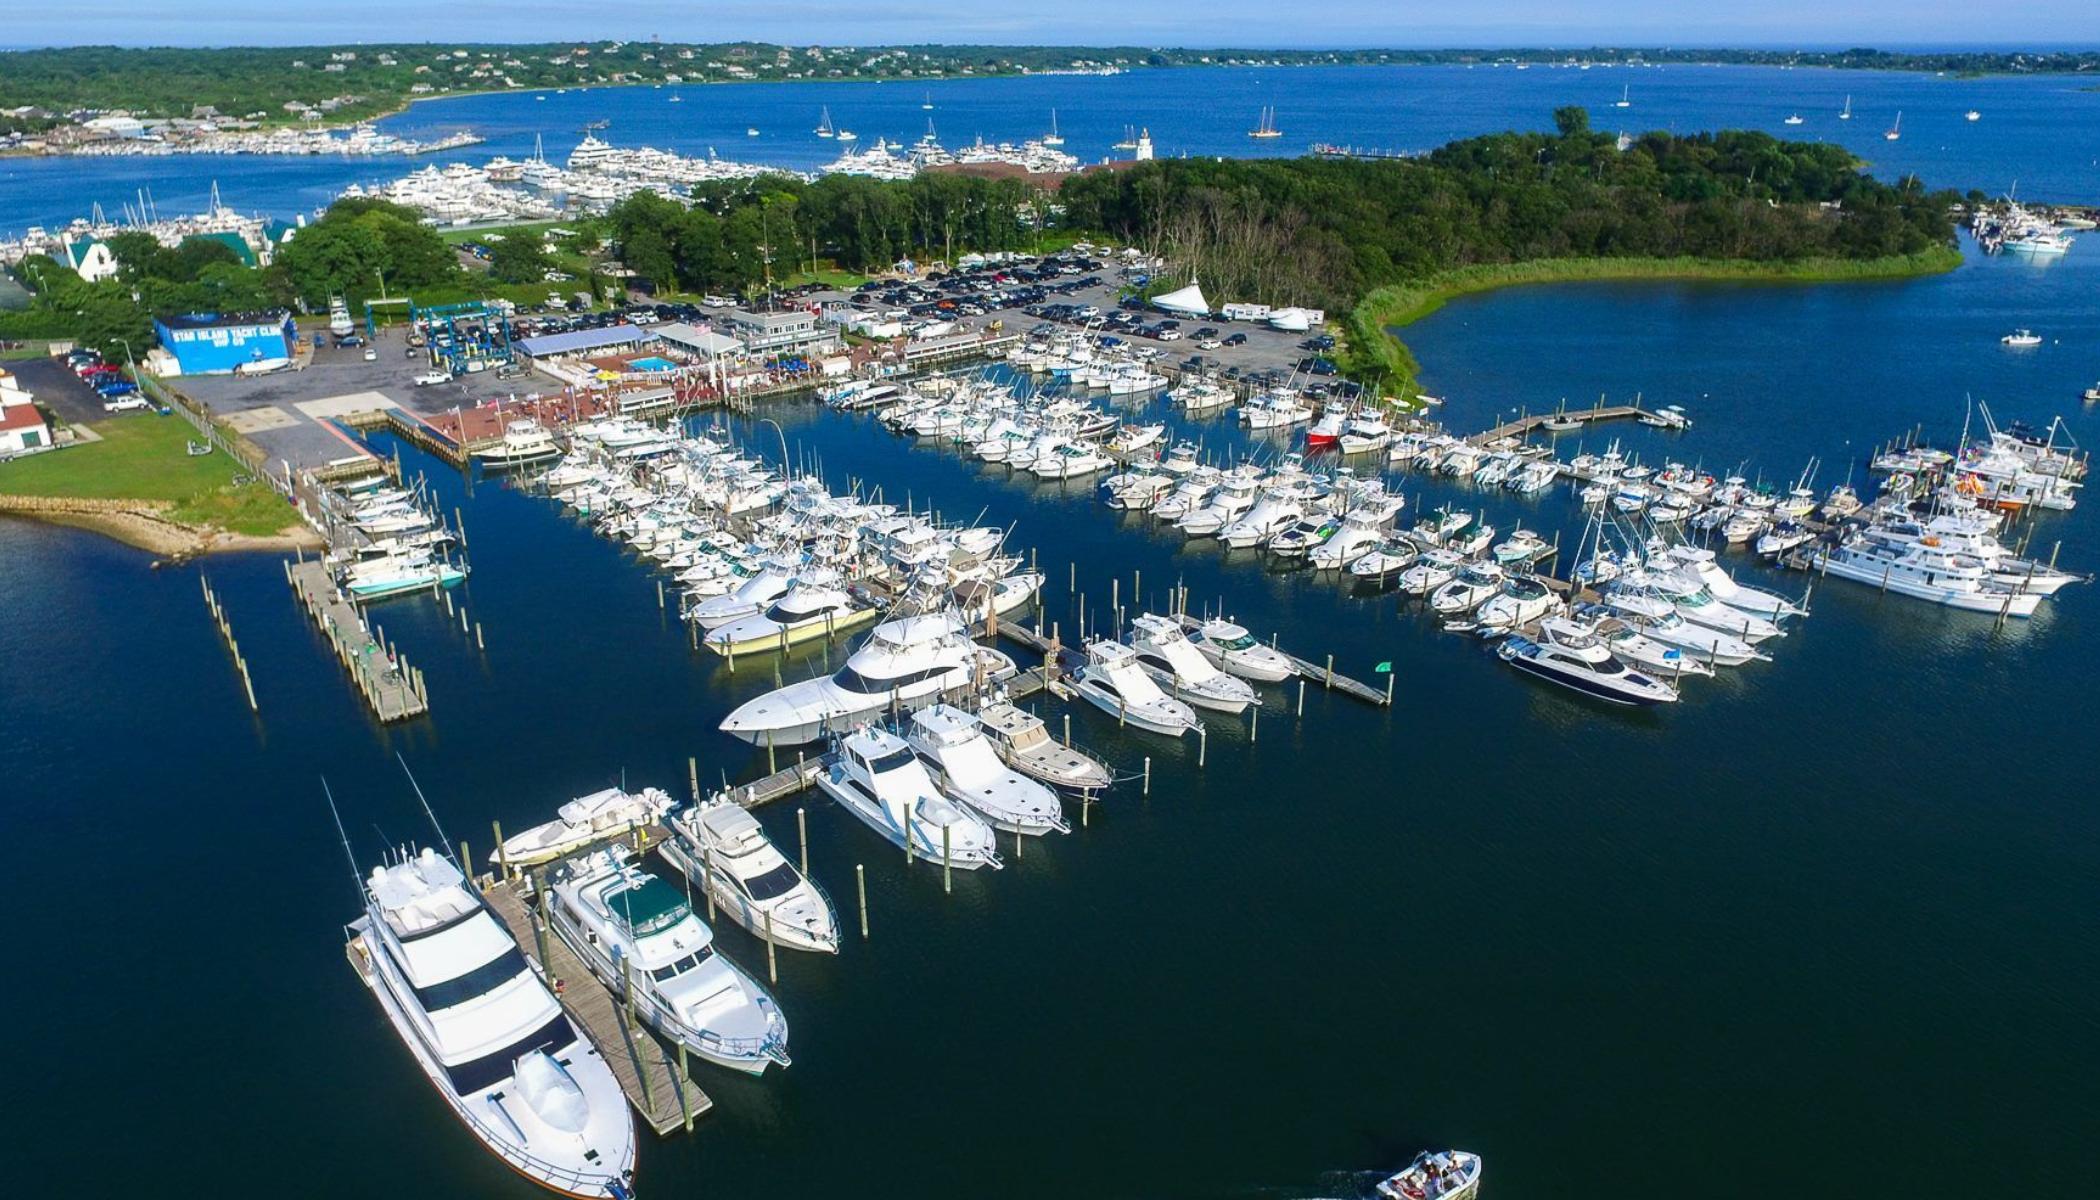 Dockwa   Marina dock, slip, and mooring reservations made